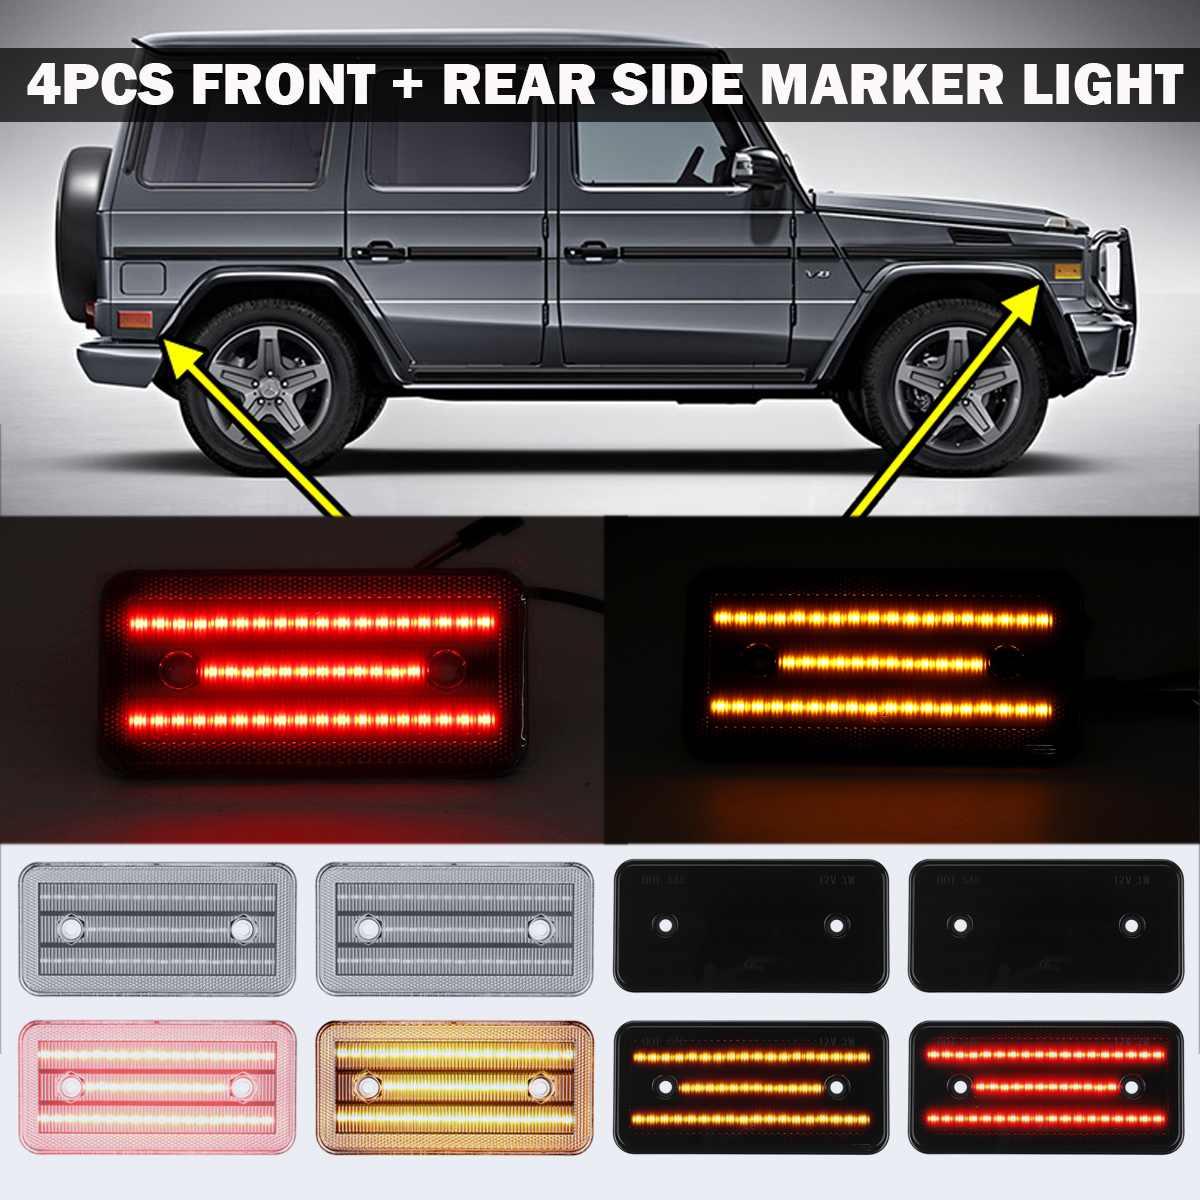 4Pcs/Set LED Side Marker Bumper Lights Turn Signal Lamps For Mercedes W463 G-Class G500 G550 G55 G63 For AMG 02-14